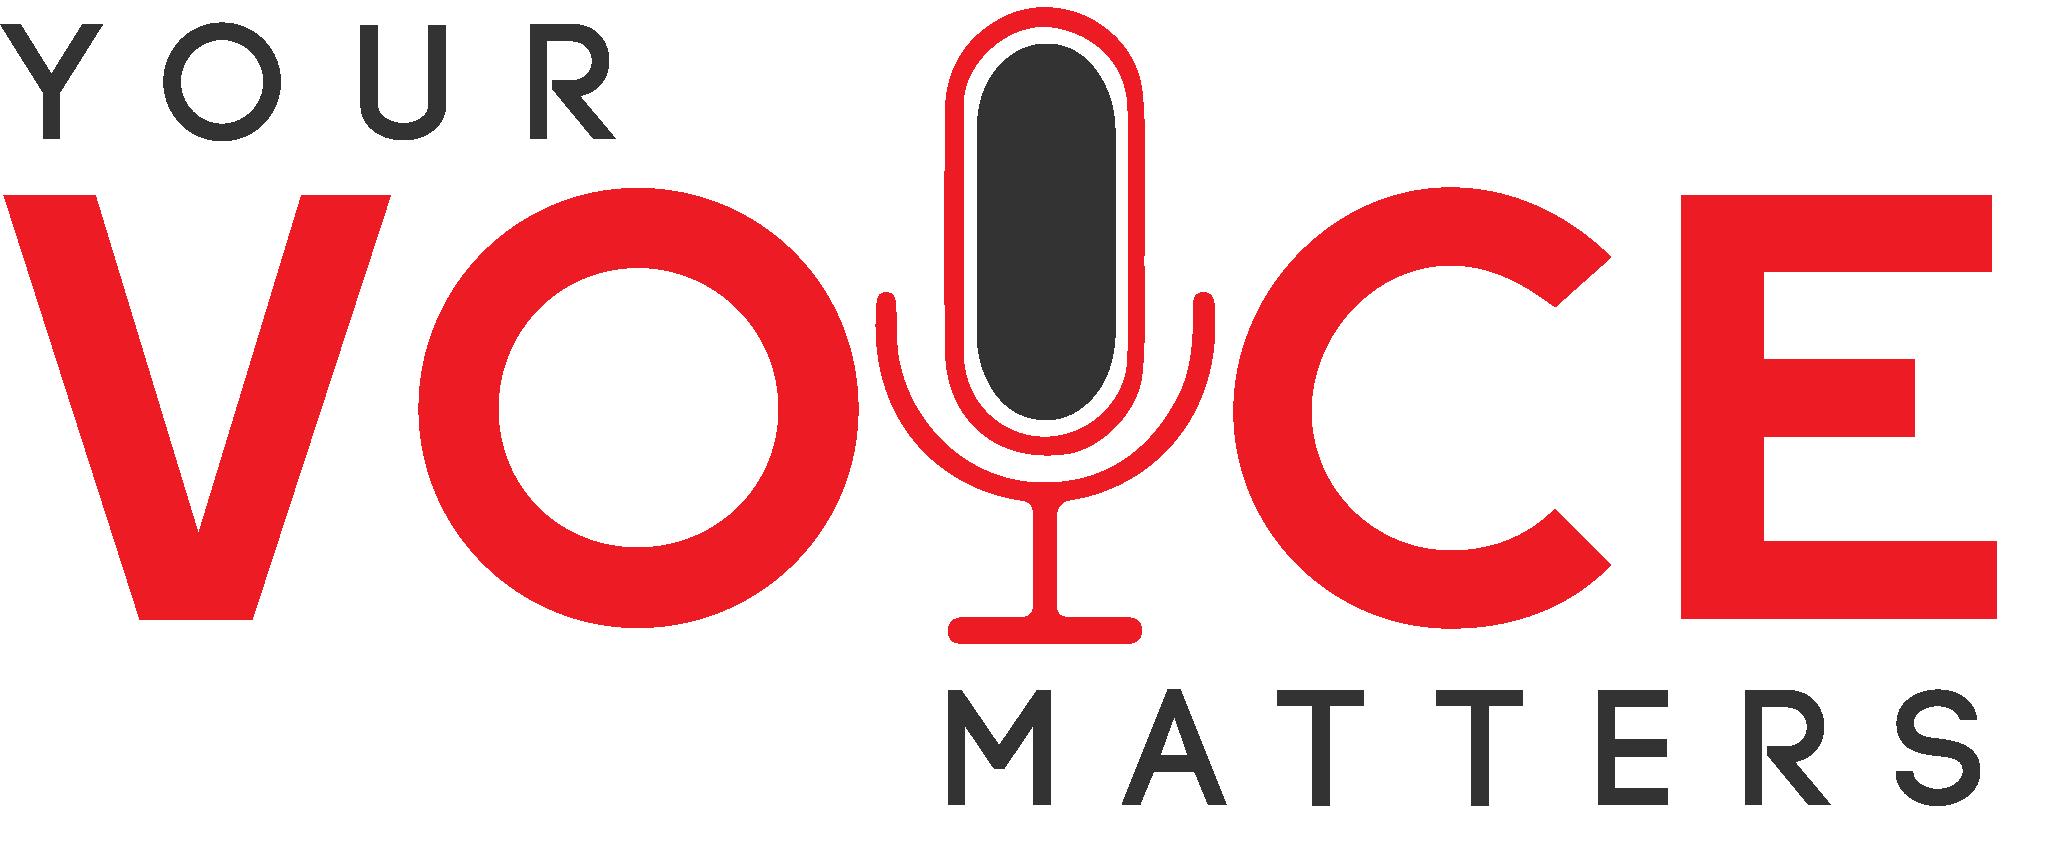 Programs your voice matters. Competition clipart written communication